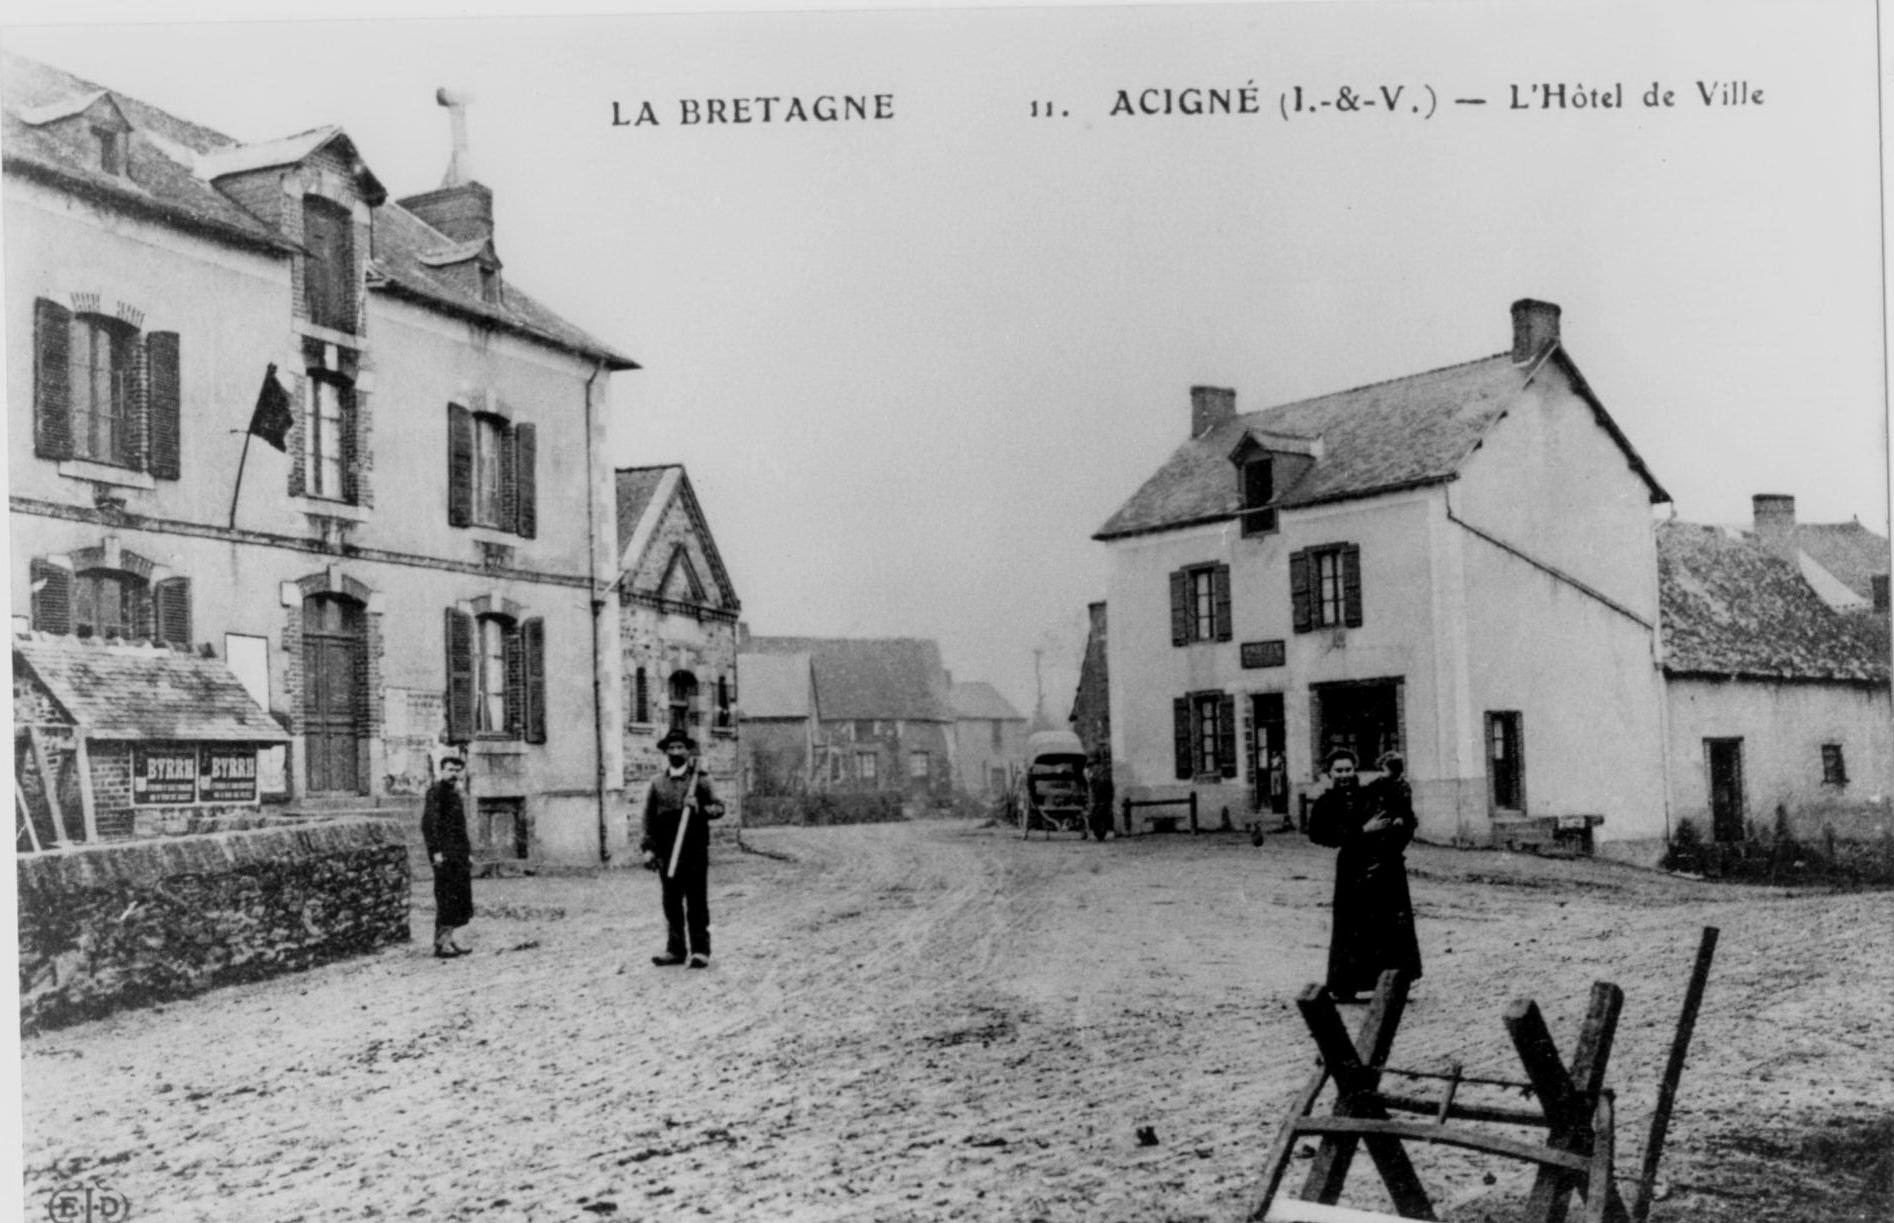 Acigné 1913